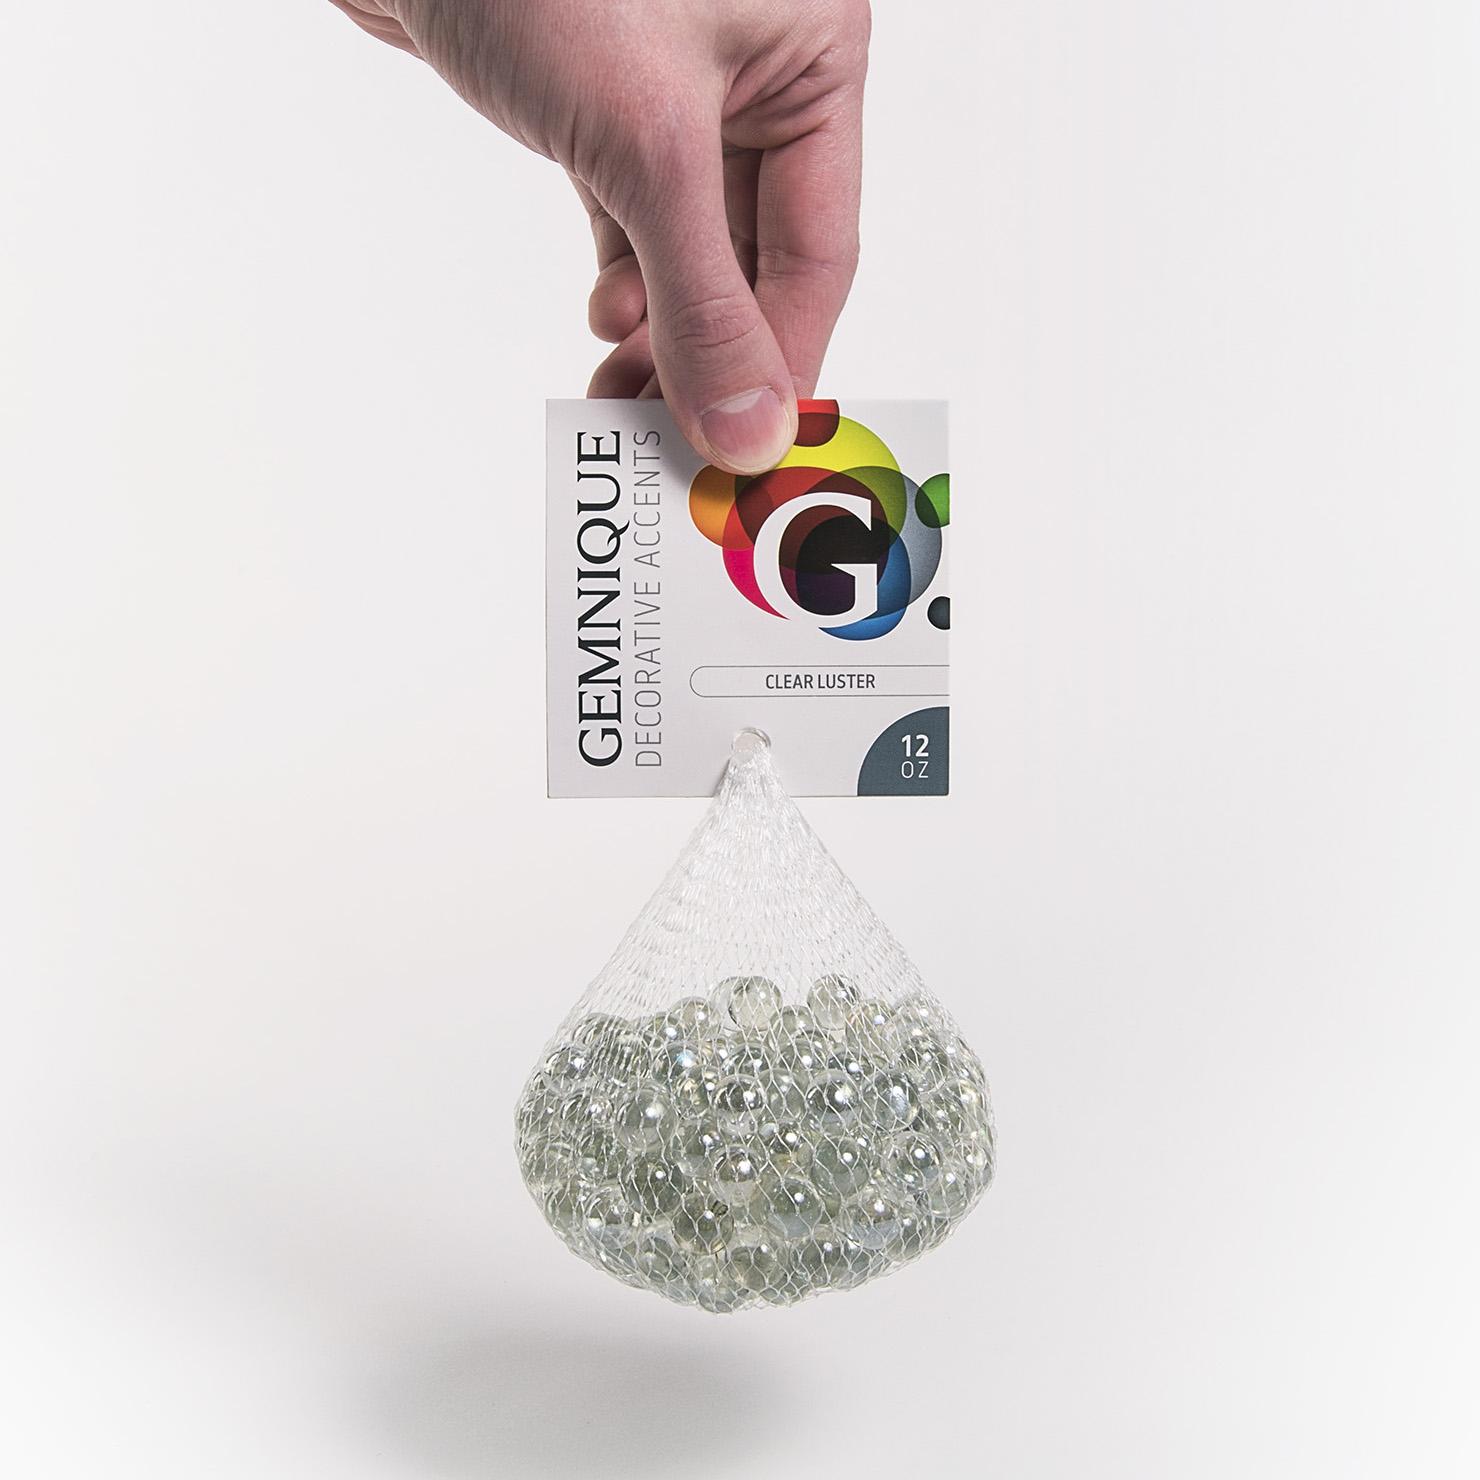 Gemnique-Packaging-2